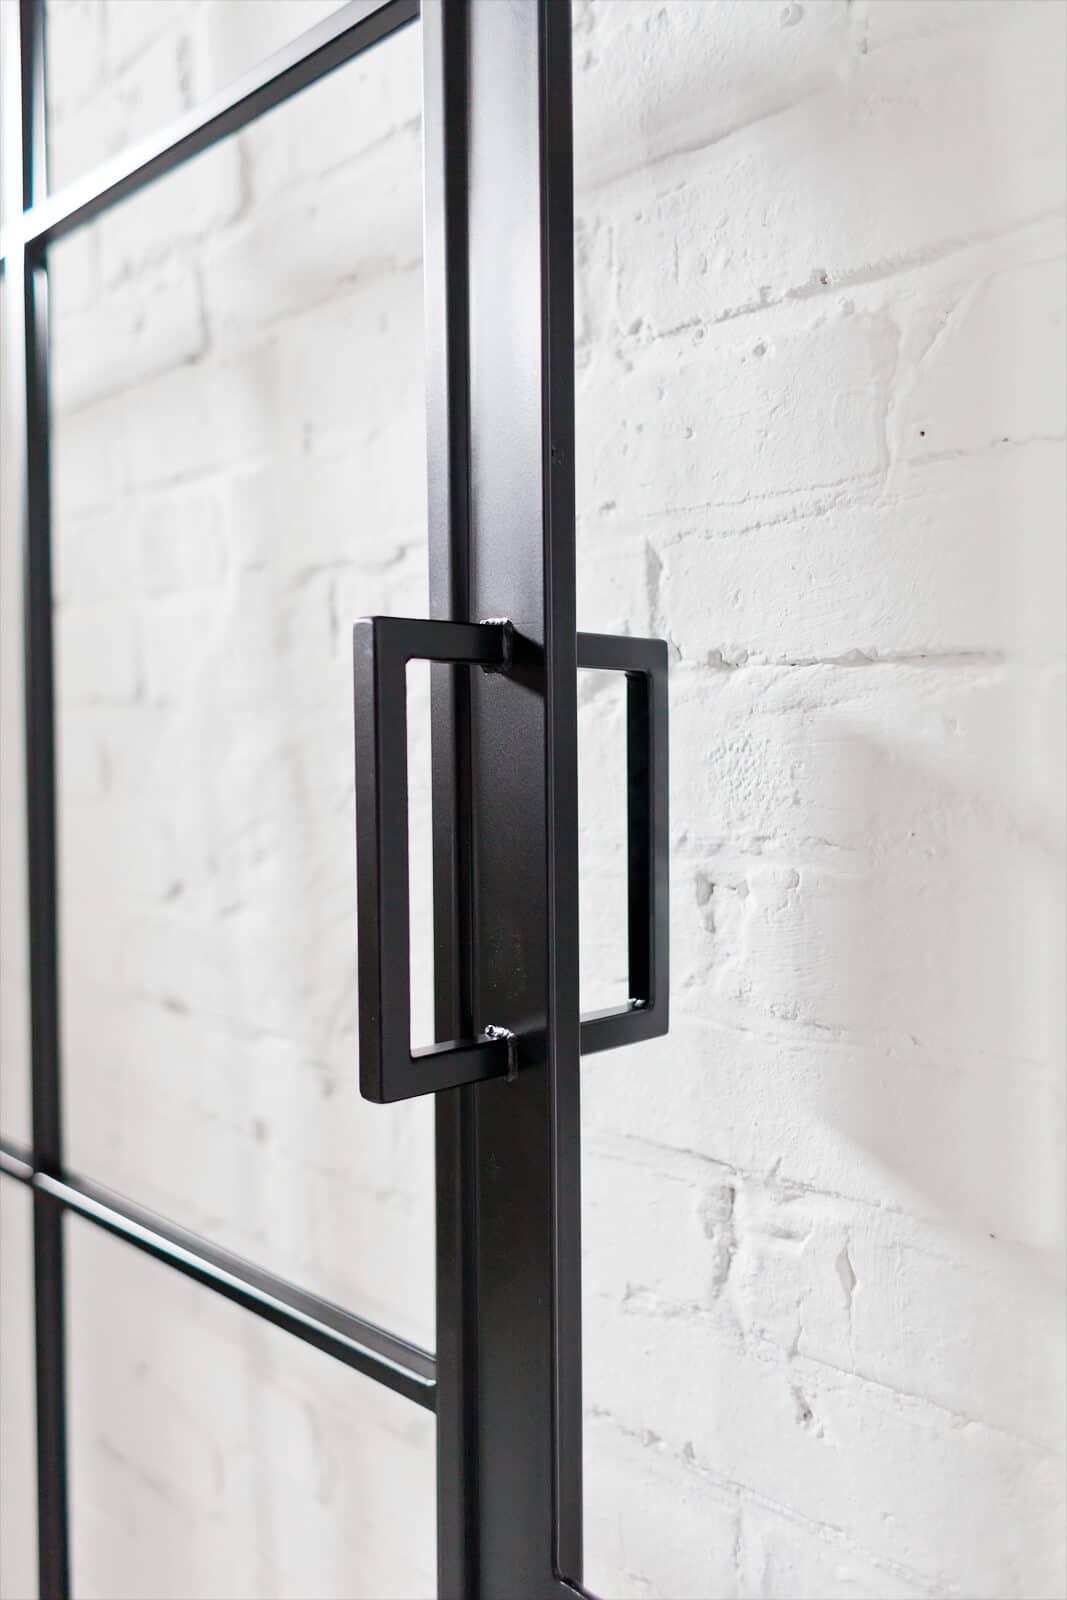 kurzer Griff, Loftstahl, Loft-Stahl.de - N51E12, Stahl Loft Tür, Türgriff, Griff, Griffstange Kurz, Türbeschlag